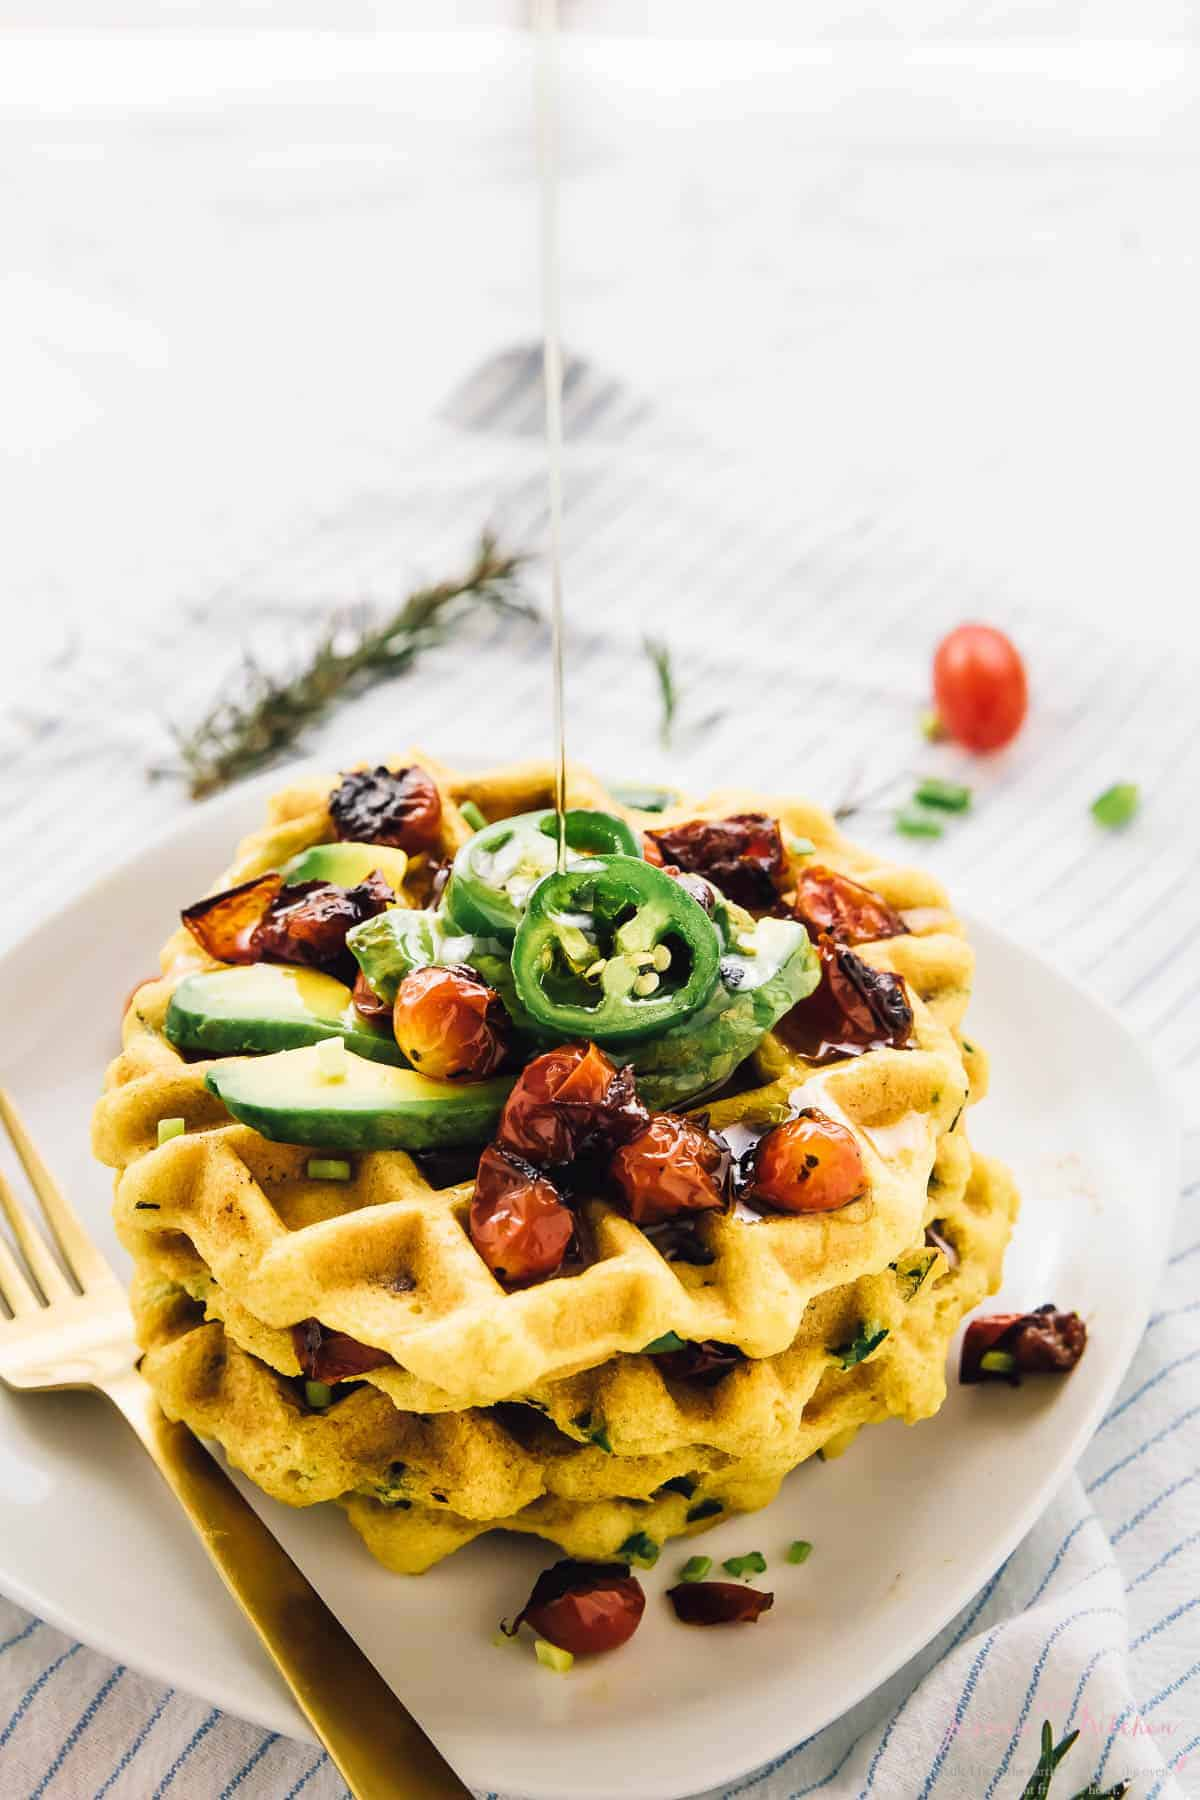 Jalapeo Cornbread Waffles with Roasted Garlic & Rosemary (Vegan + Gluten Free)